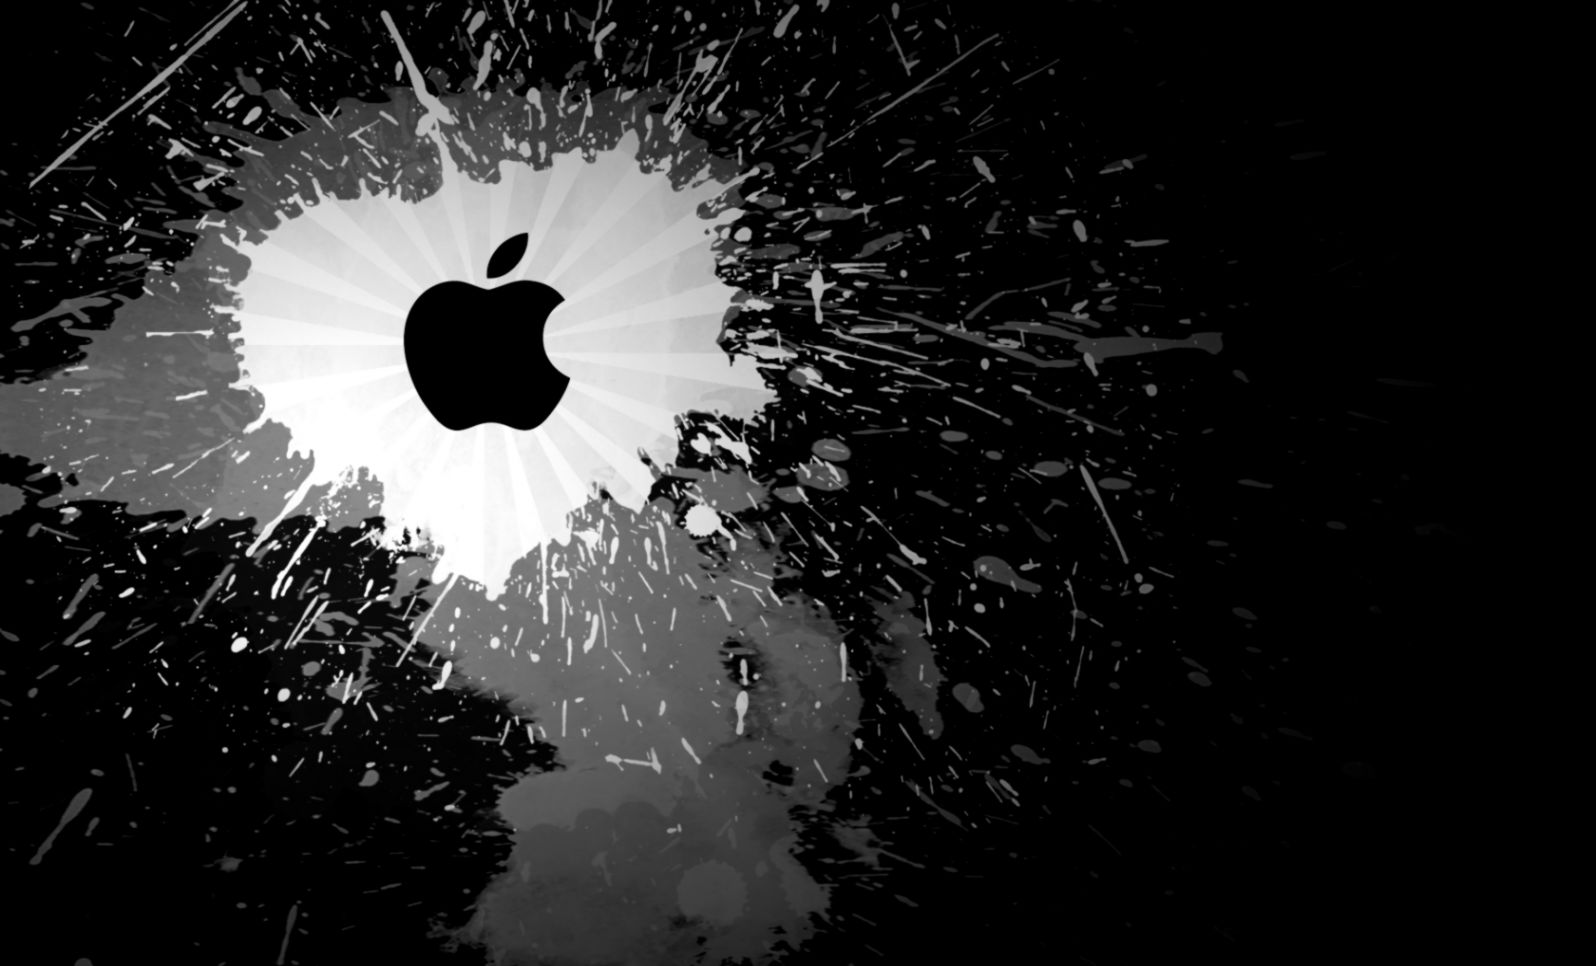 Dark Abstract Apple Mac Wallpaper Wallpapers Base